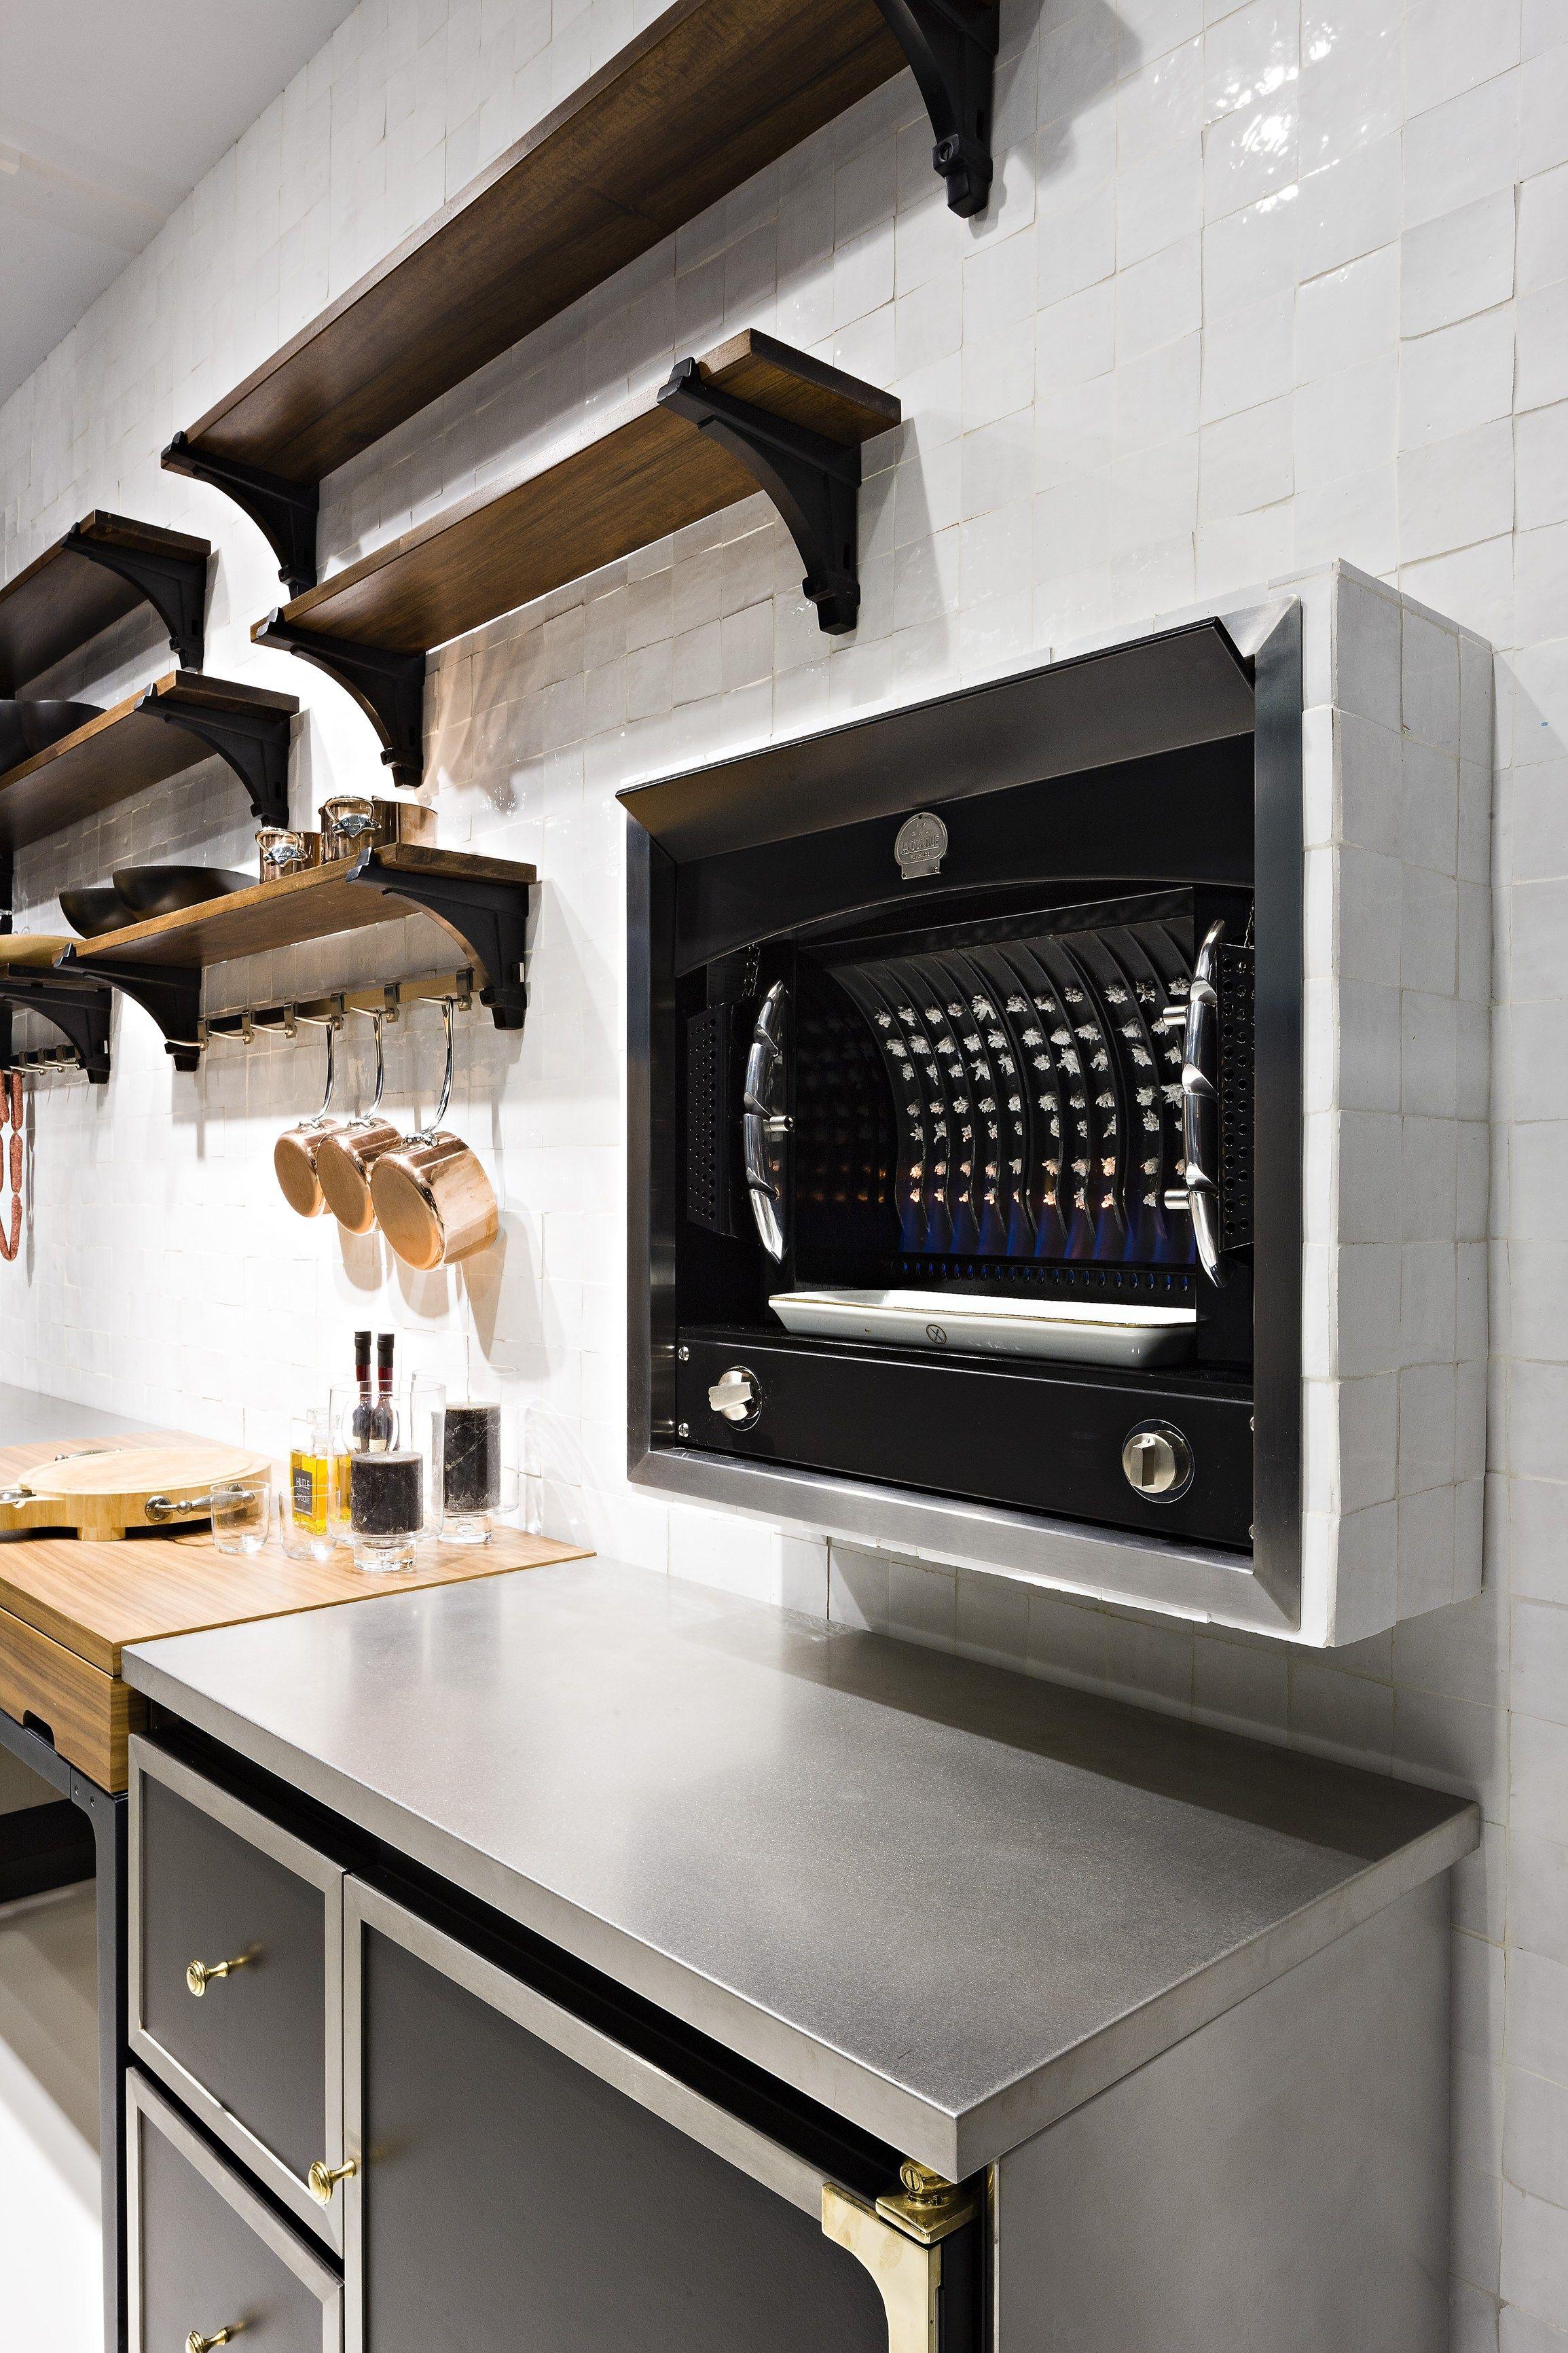 Built In Oven Flamberge Rotisserie By La Cornue Built In Ovens Outdoor Kitchen Design